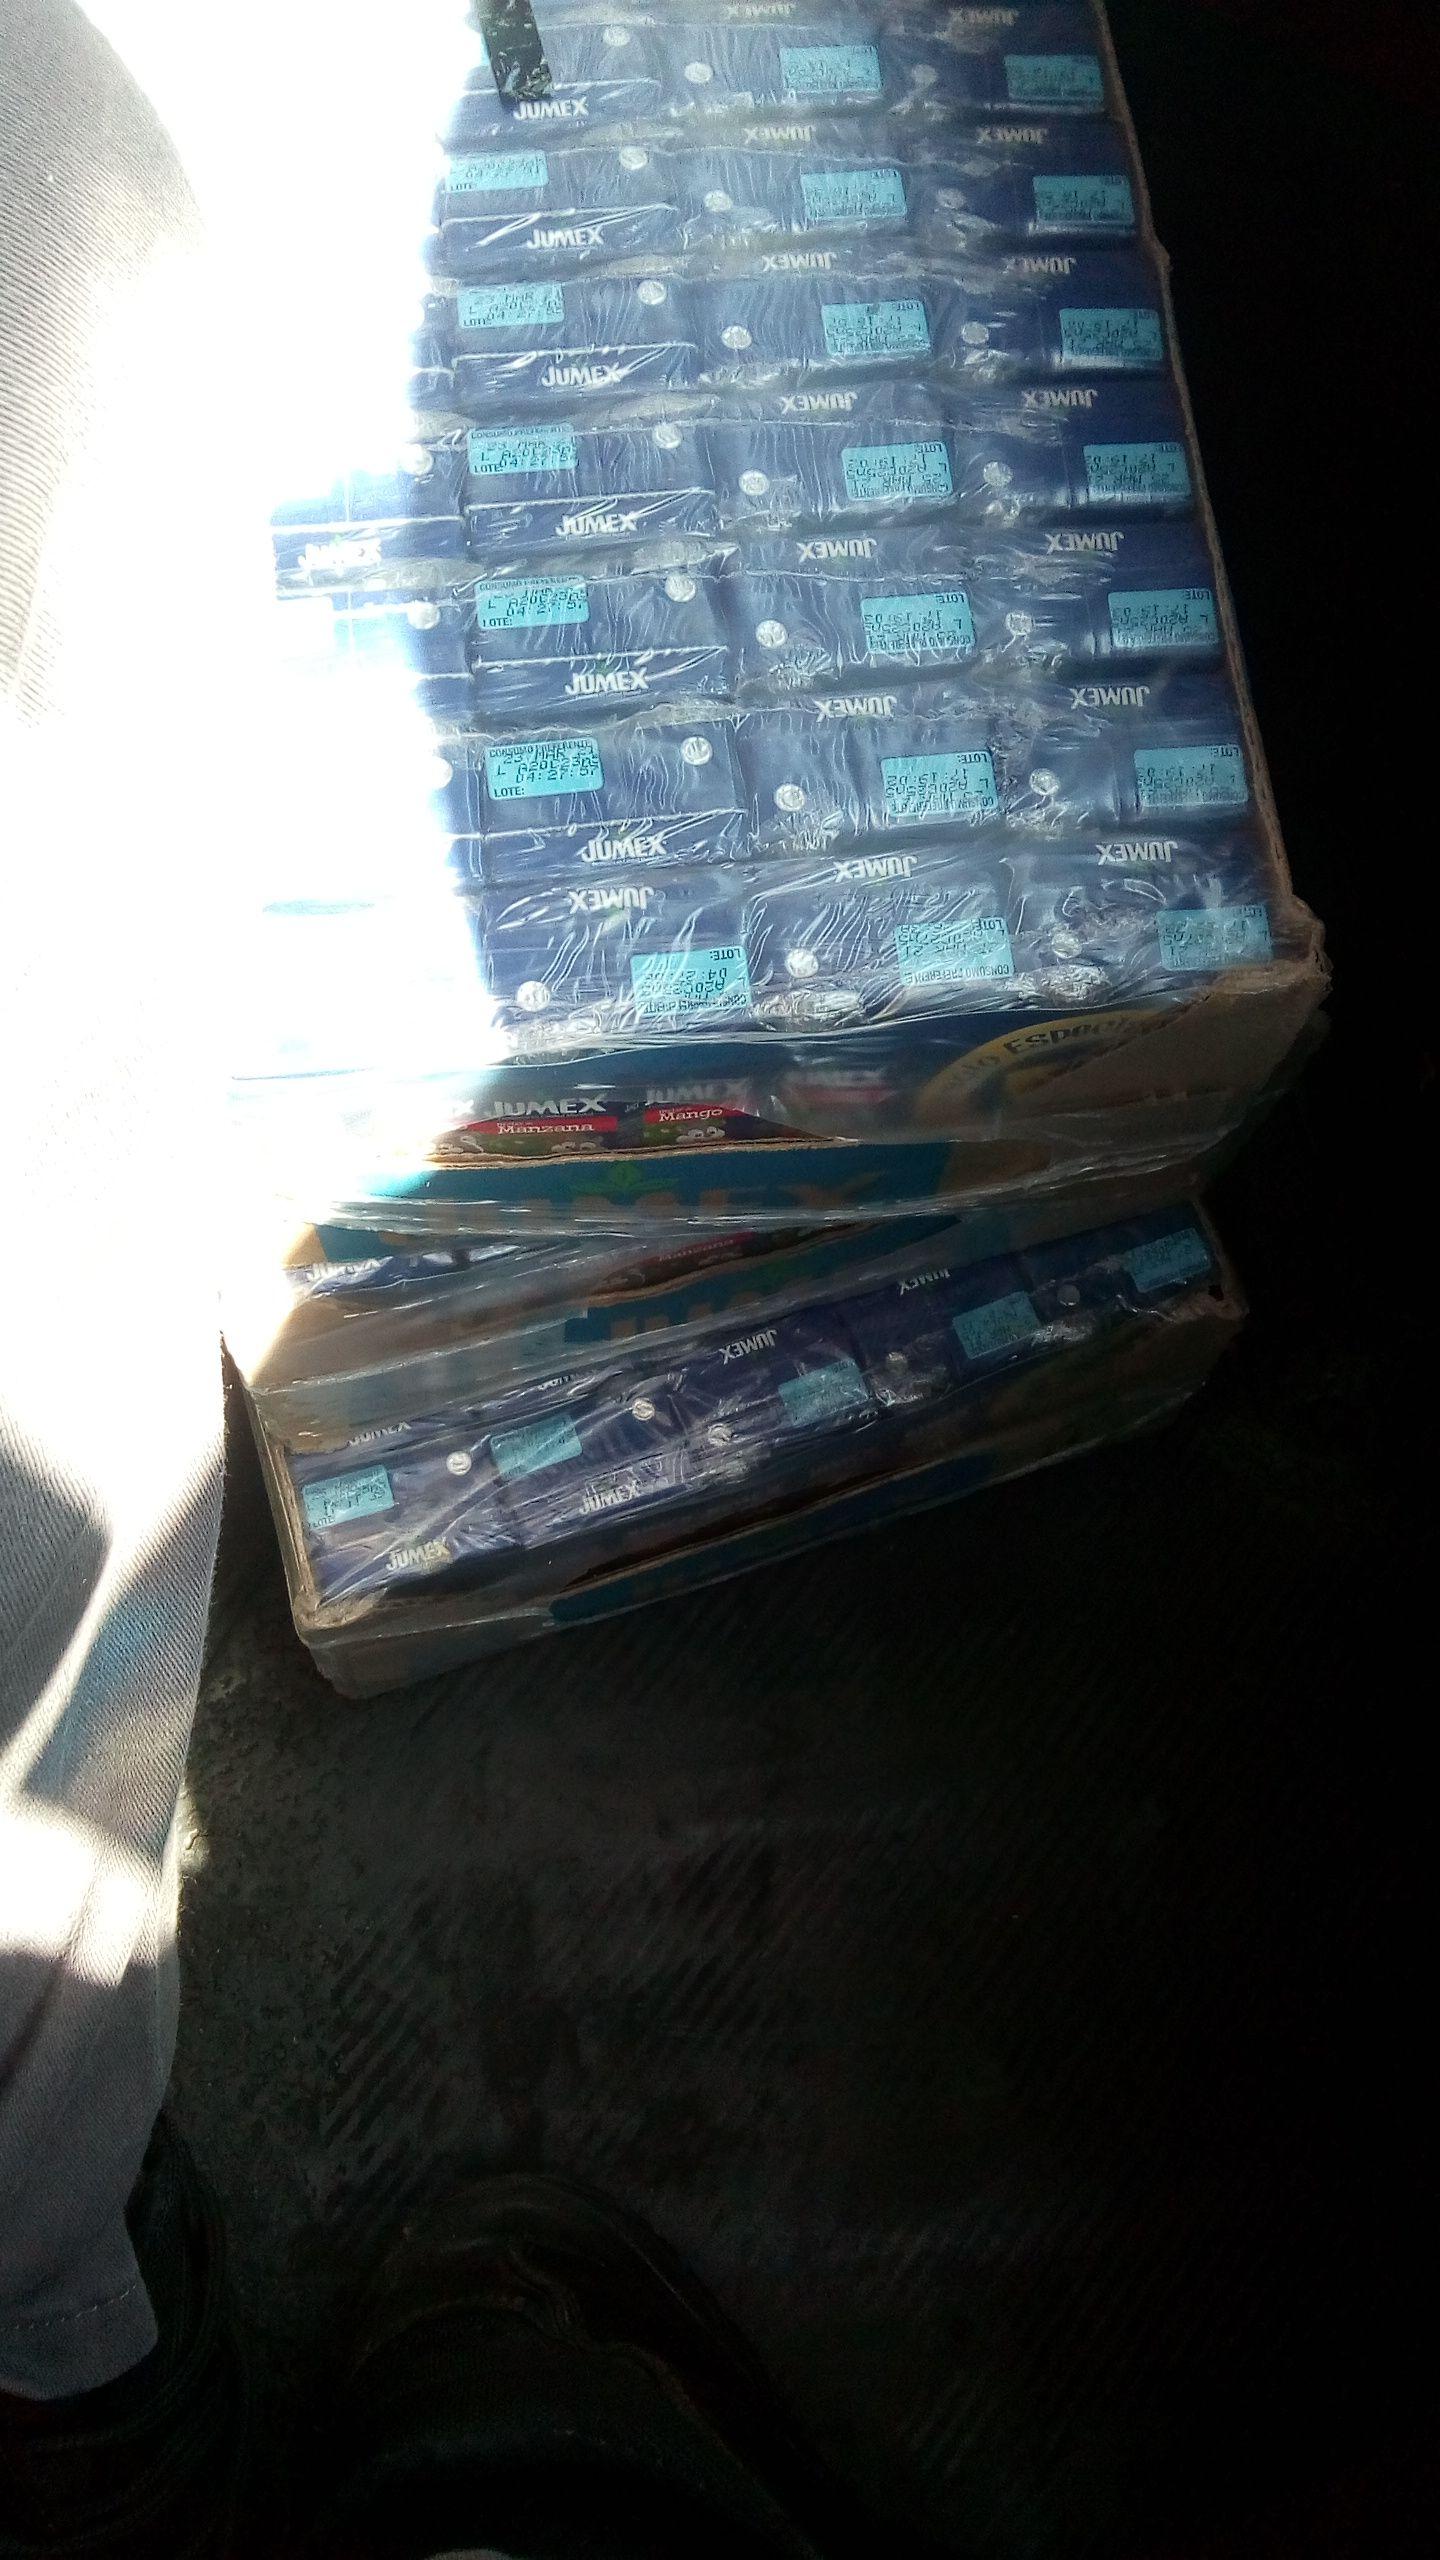 HEB Jumex 5 pack 125 ML